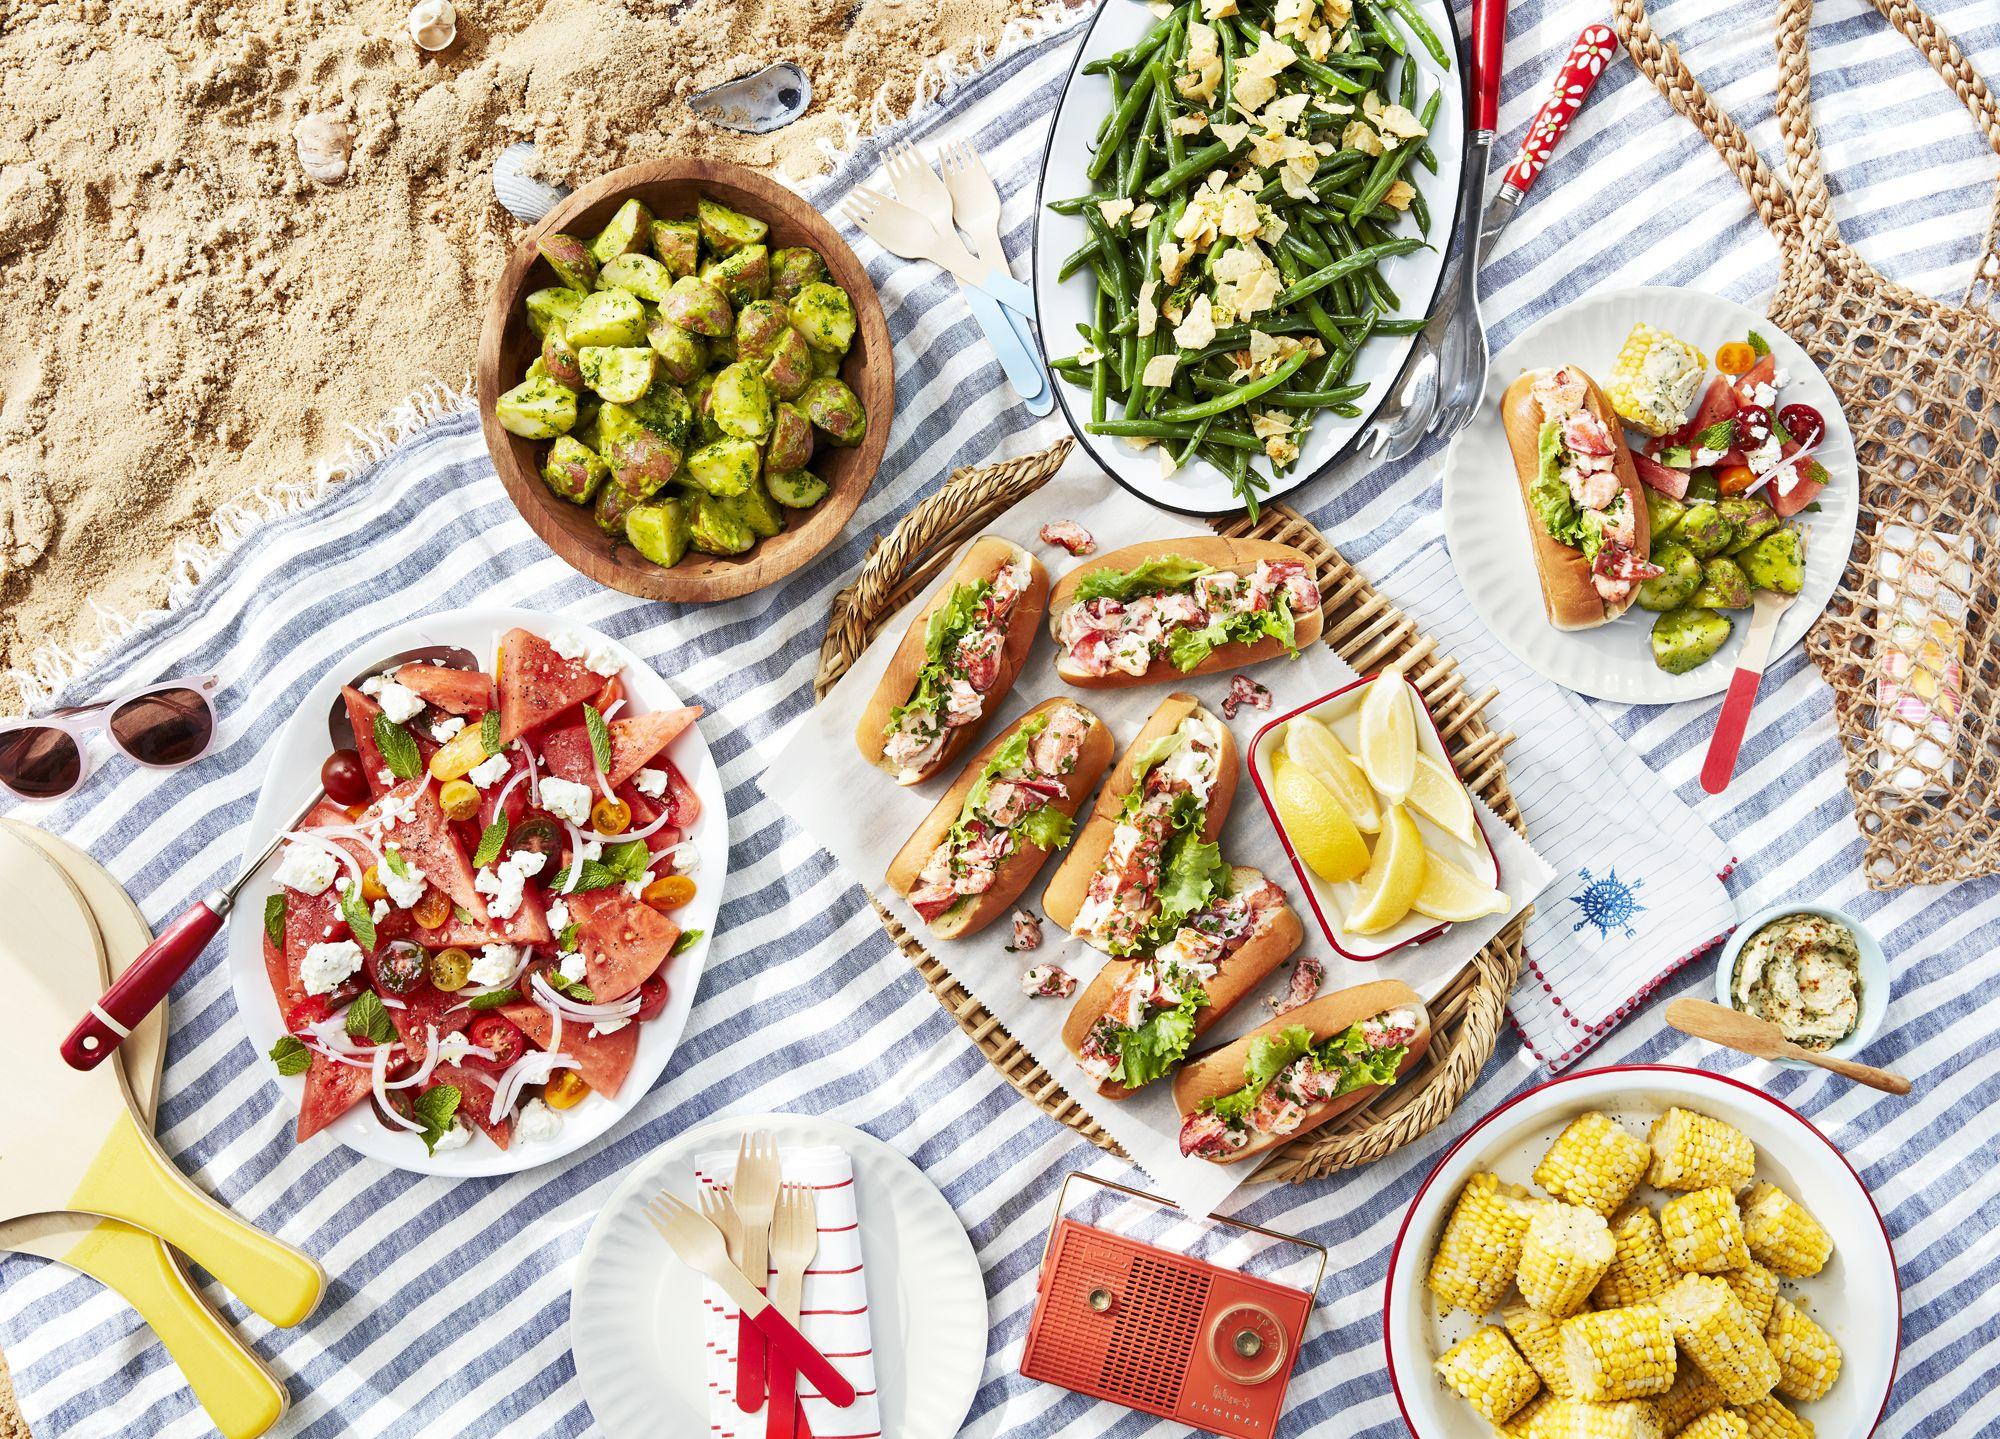 88 summer picnic food